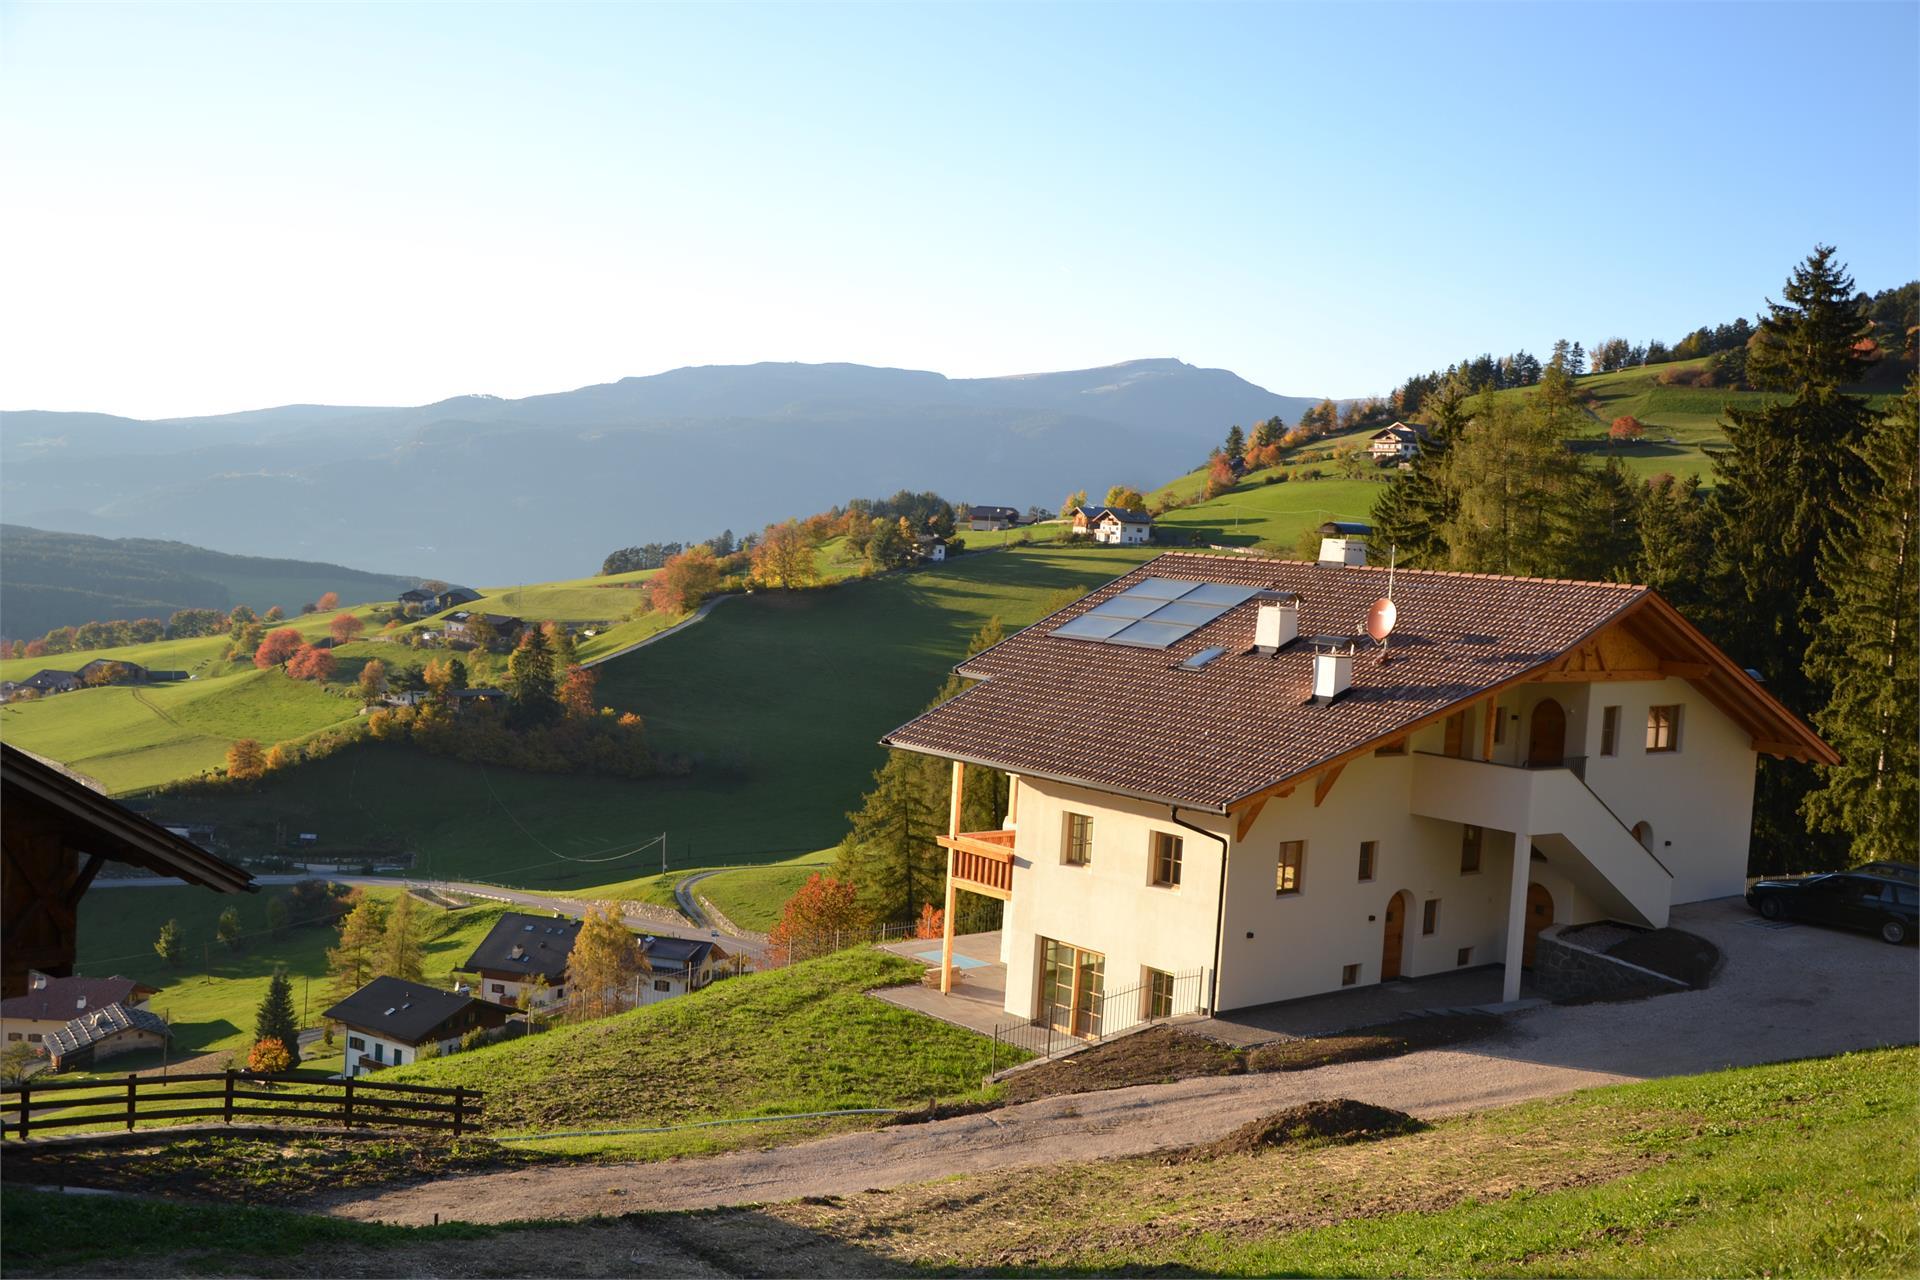 Oberfulterhof